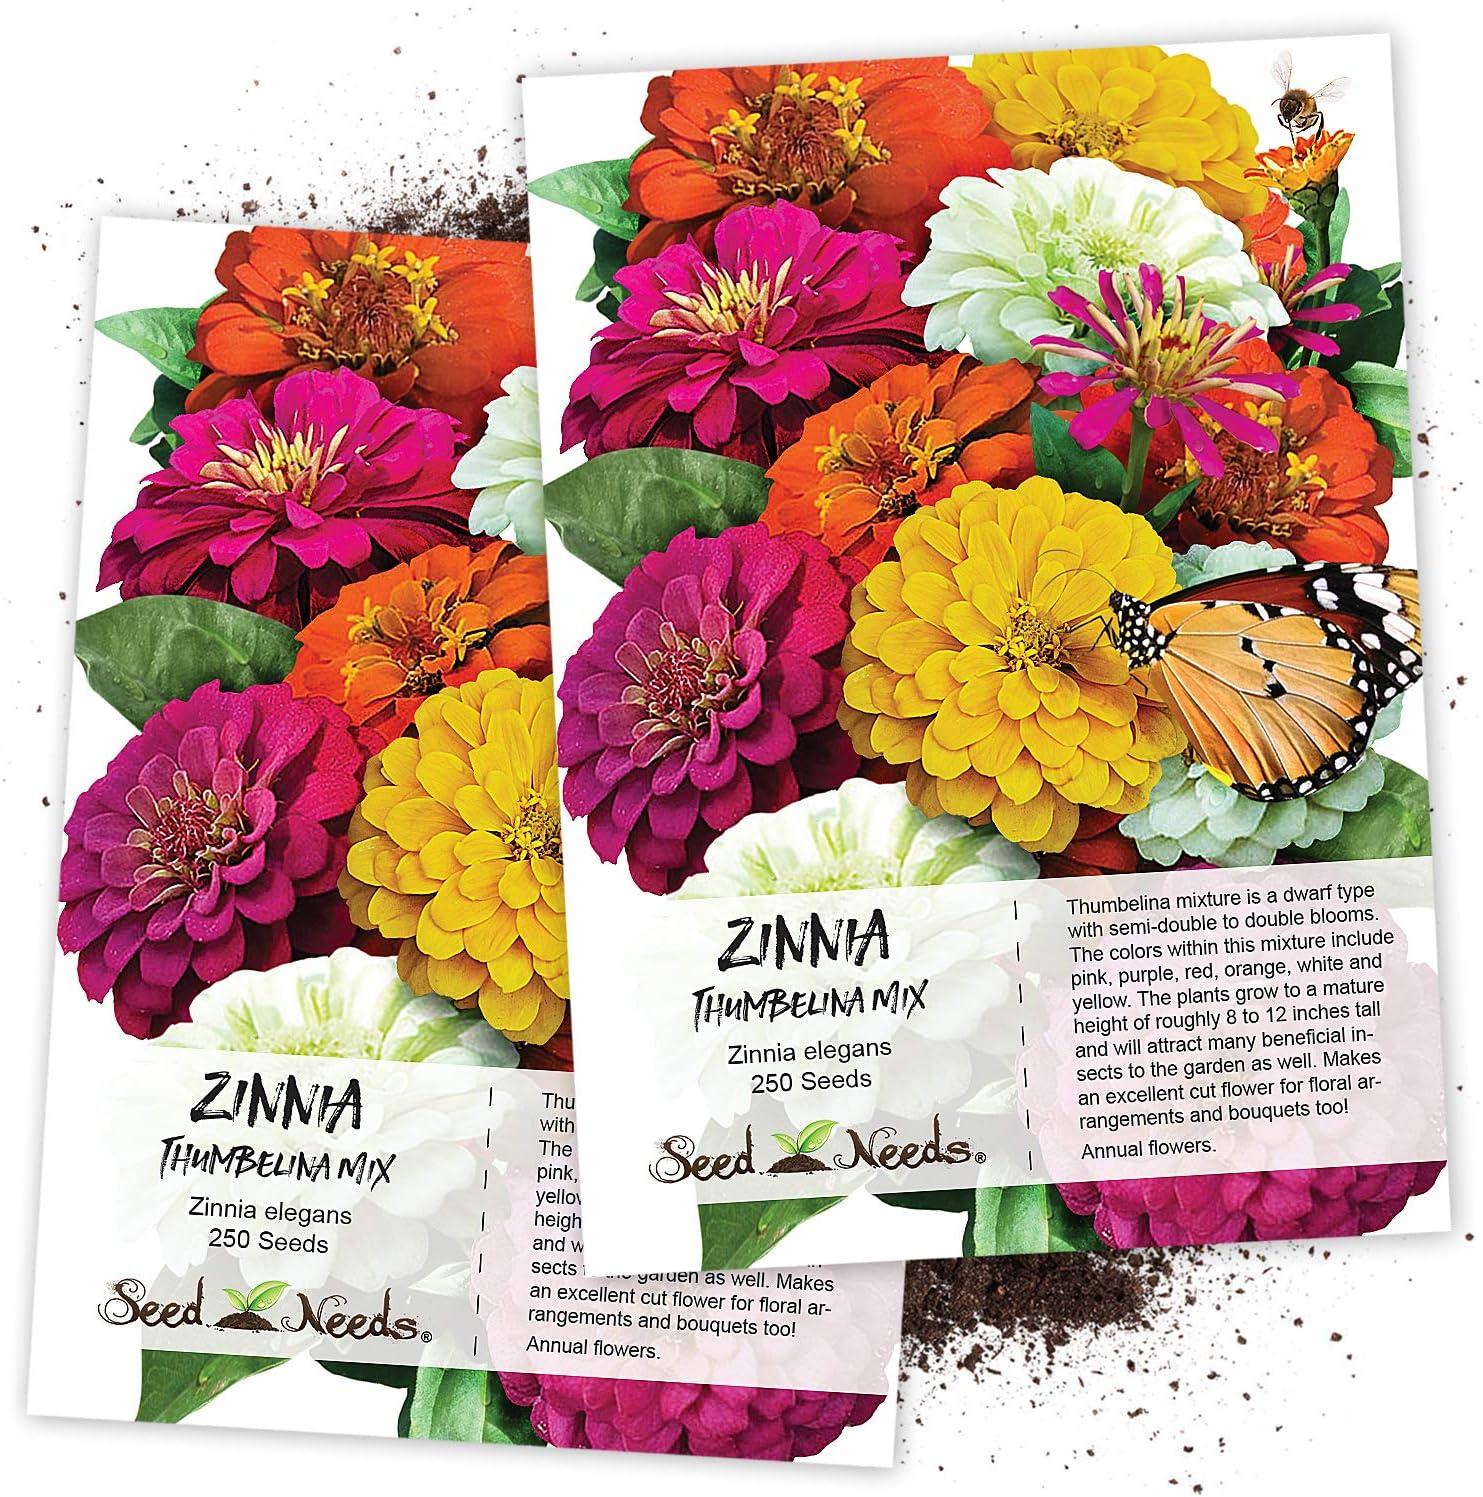 Amazon Com Seed Needs Thumbelina Zinnia Mixture Zinnia Elegans Twin Pack Of 250 Seeds Each Flowering Plants Garden Outdoor